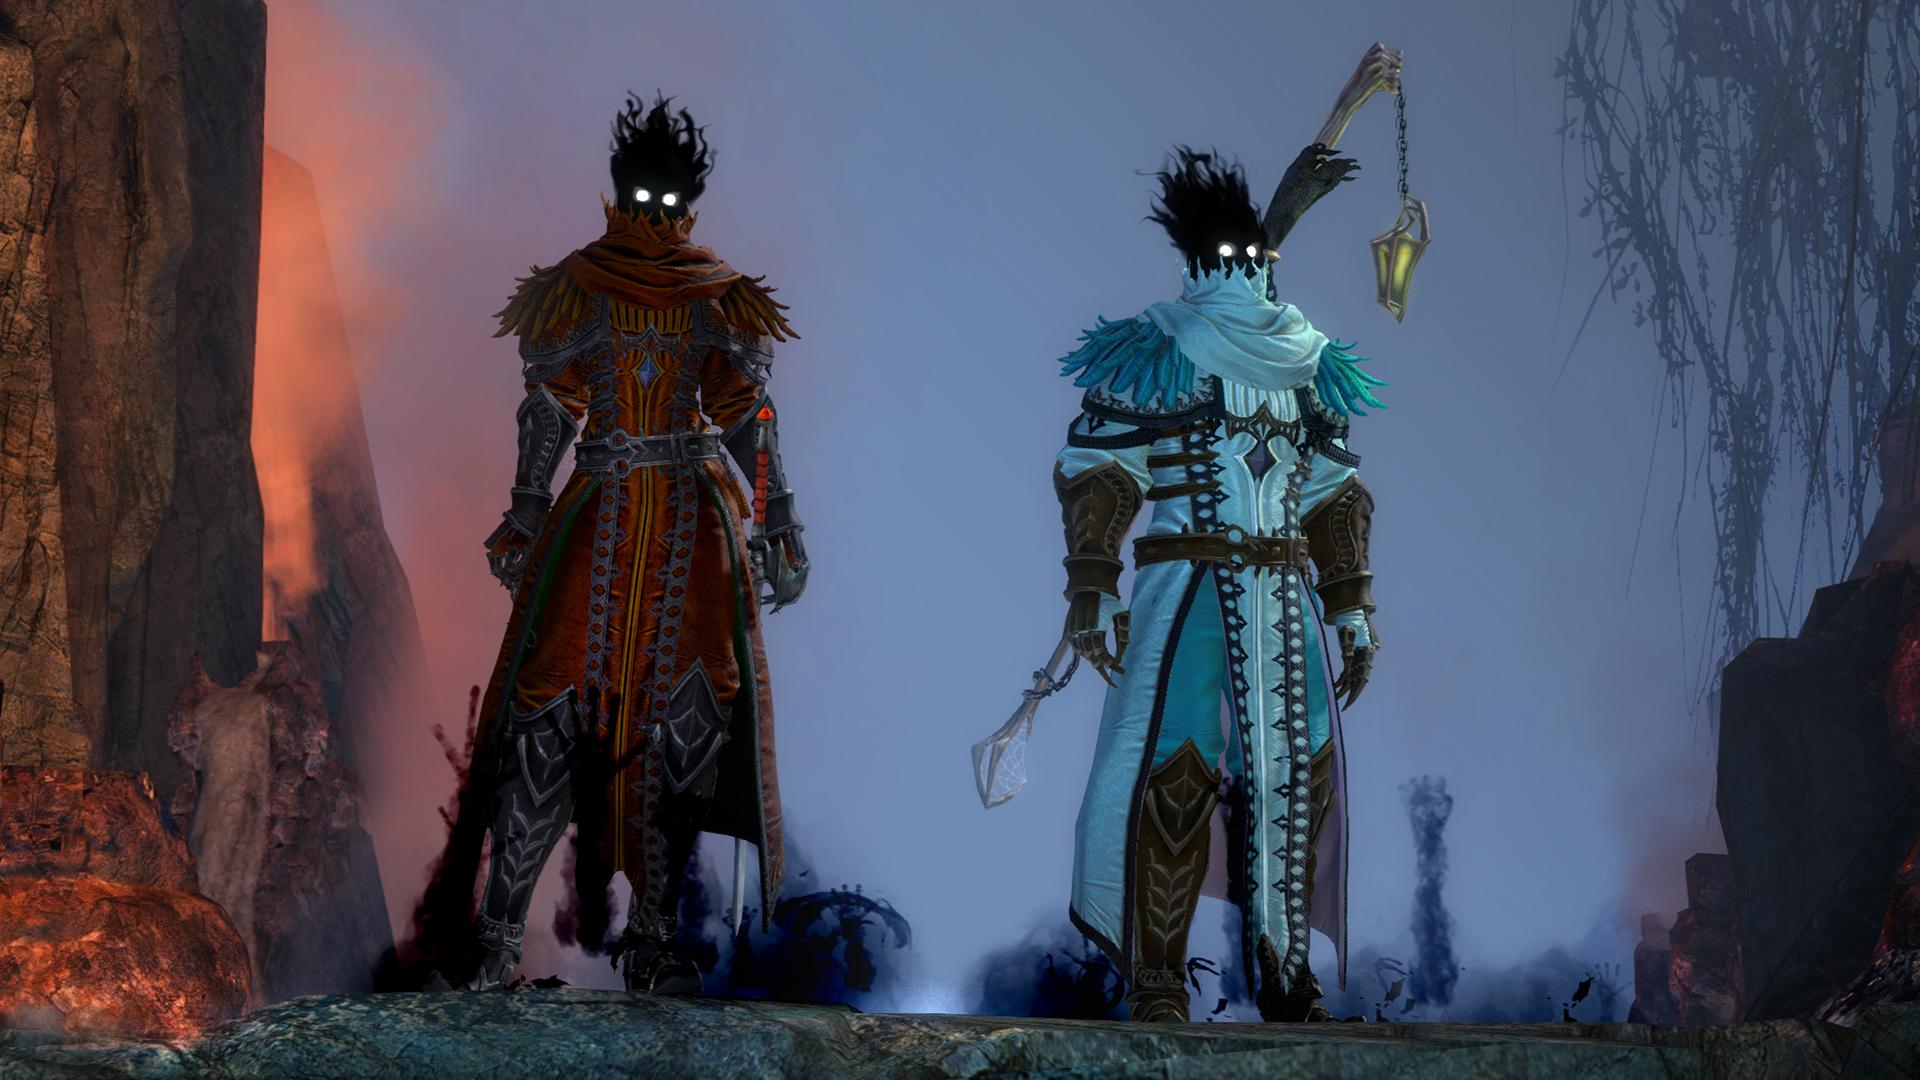 Dress Up Your Mounts for Halloween! | GuildWars2.com